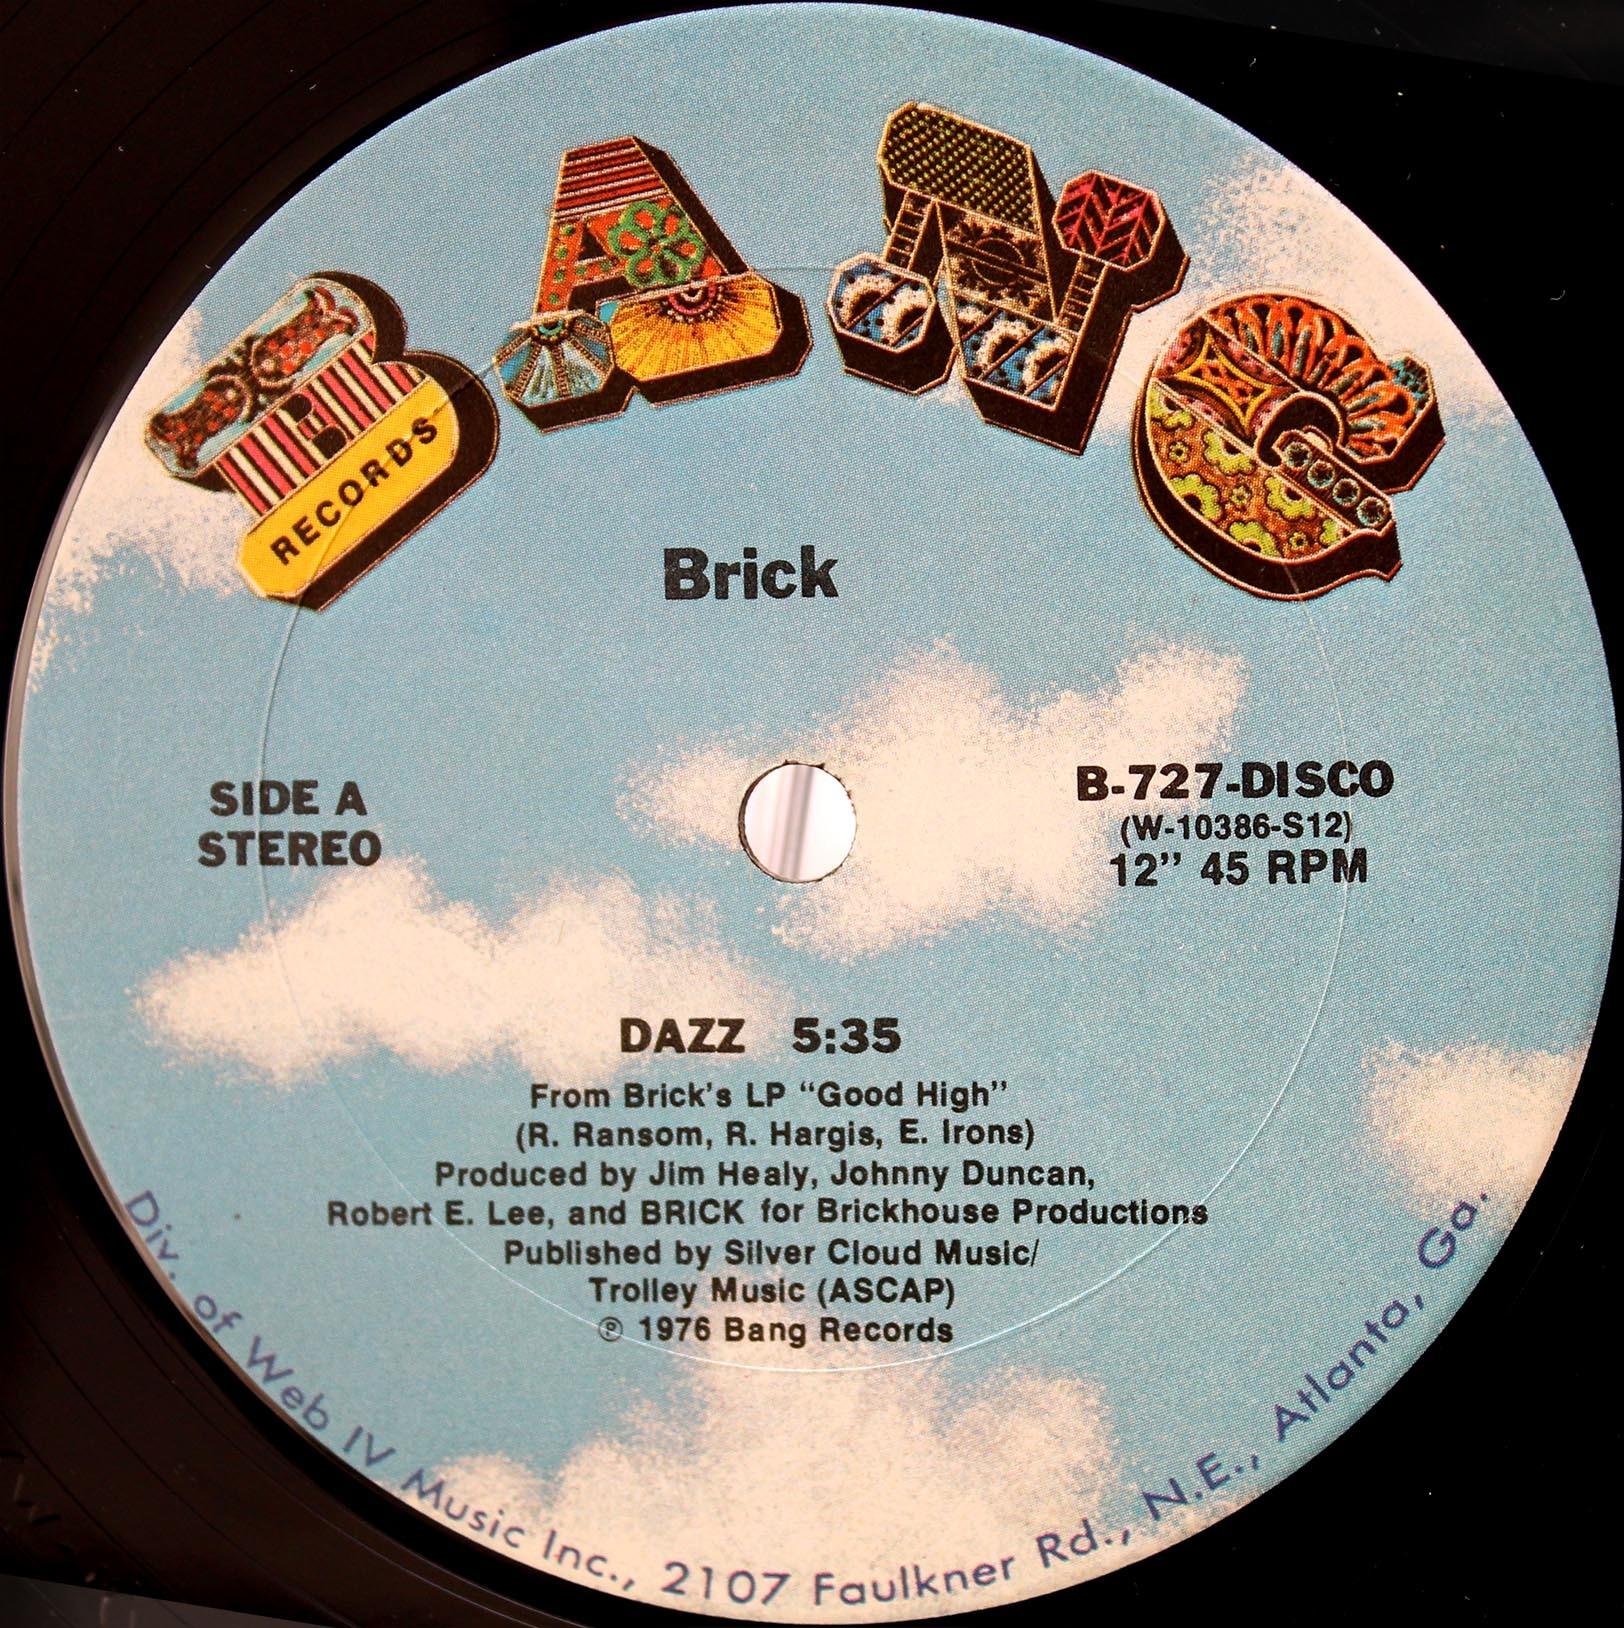 Brick Dazz 03